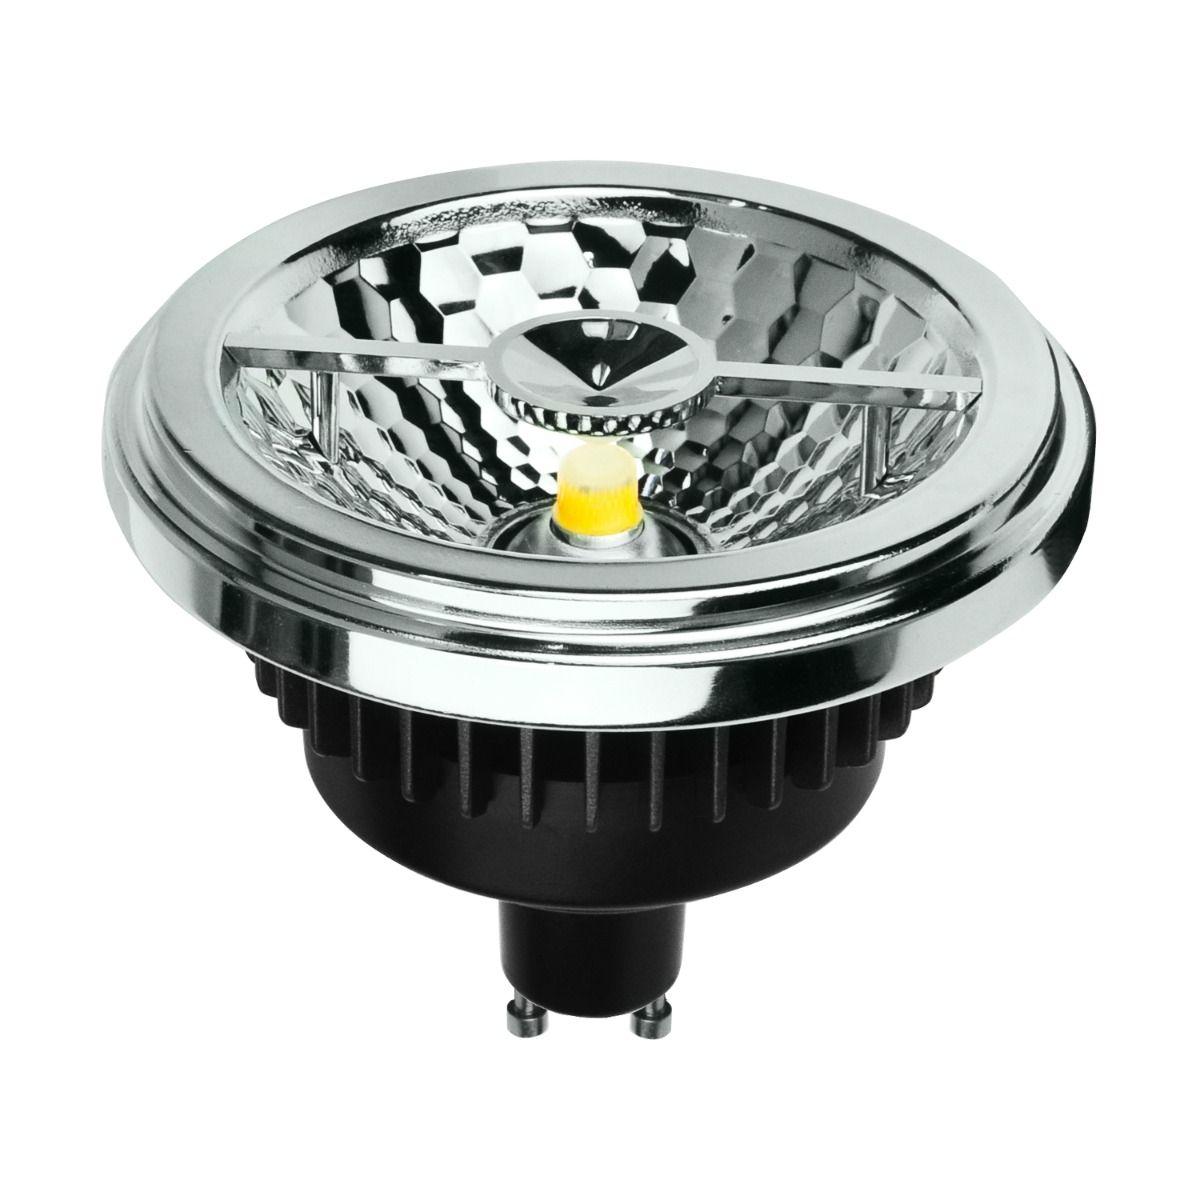 Noxion LEDspot AR111 GU10 Pro V2.0 12-50W 930 40D 620lm DIM